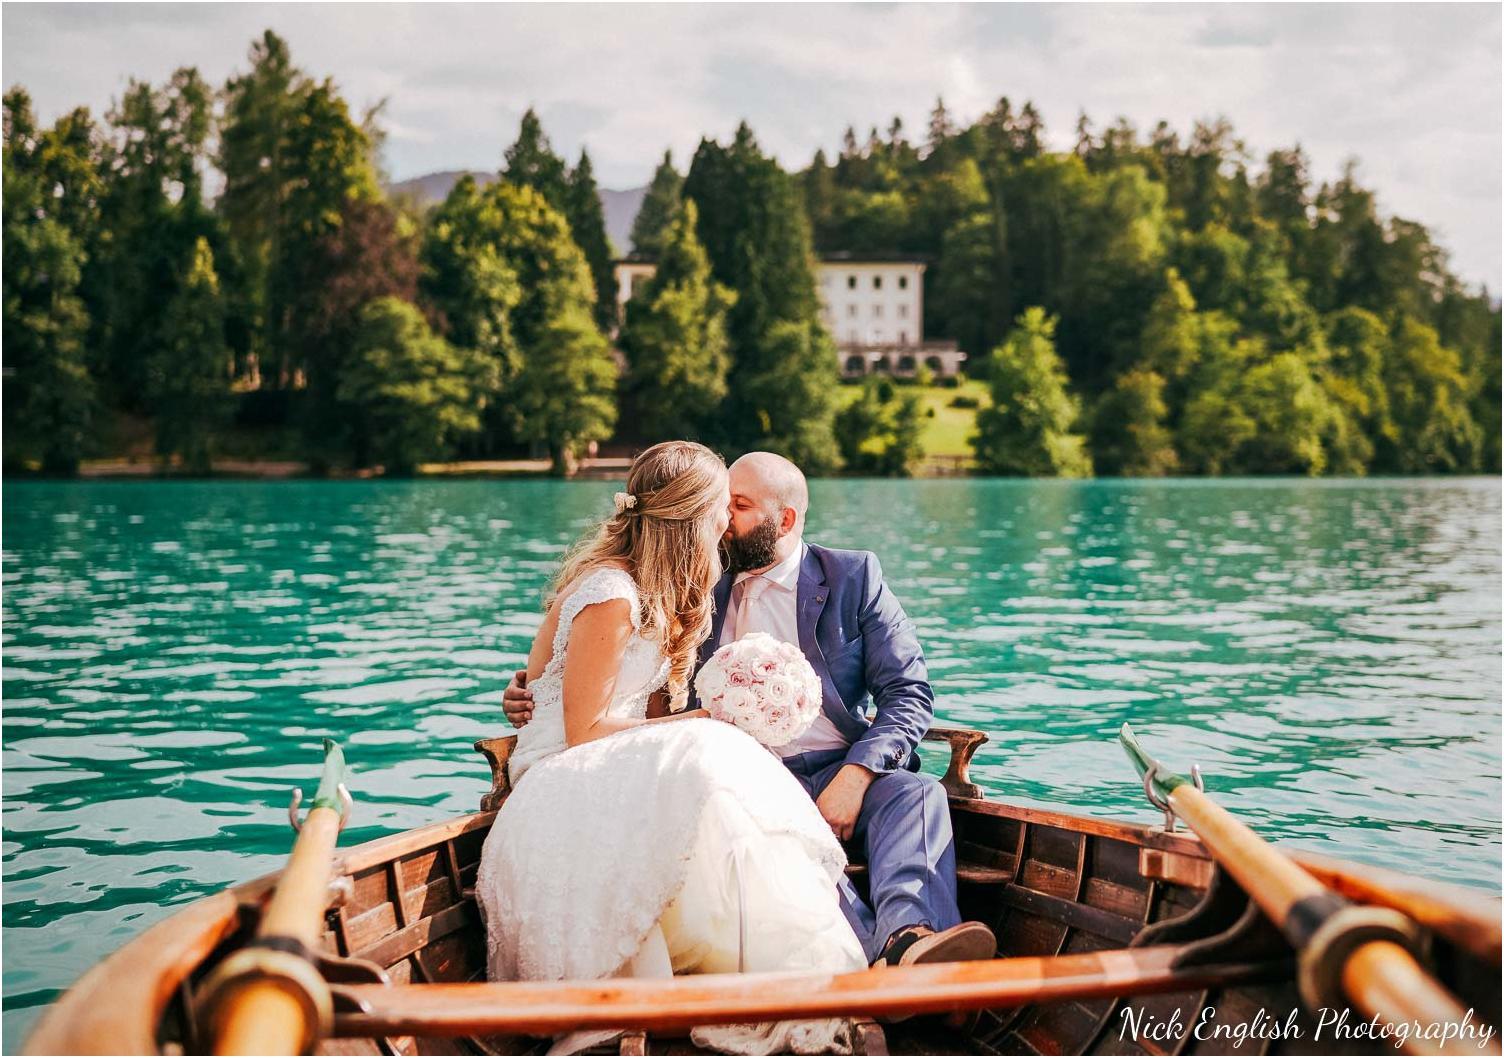 Destination_Wedding_Photographer_Slovenia_Nick_English_Photography-70-3.jpg